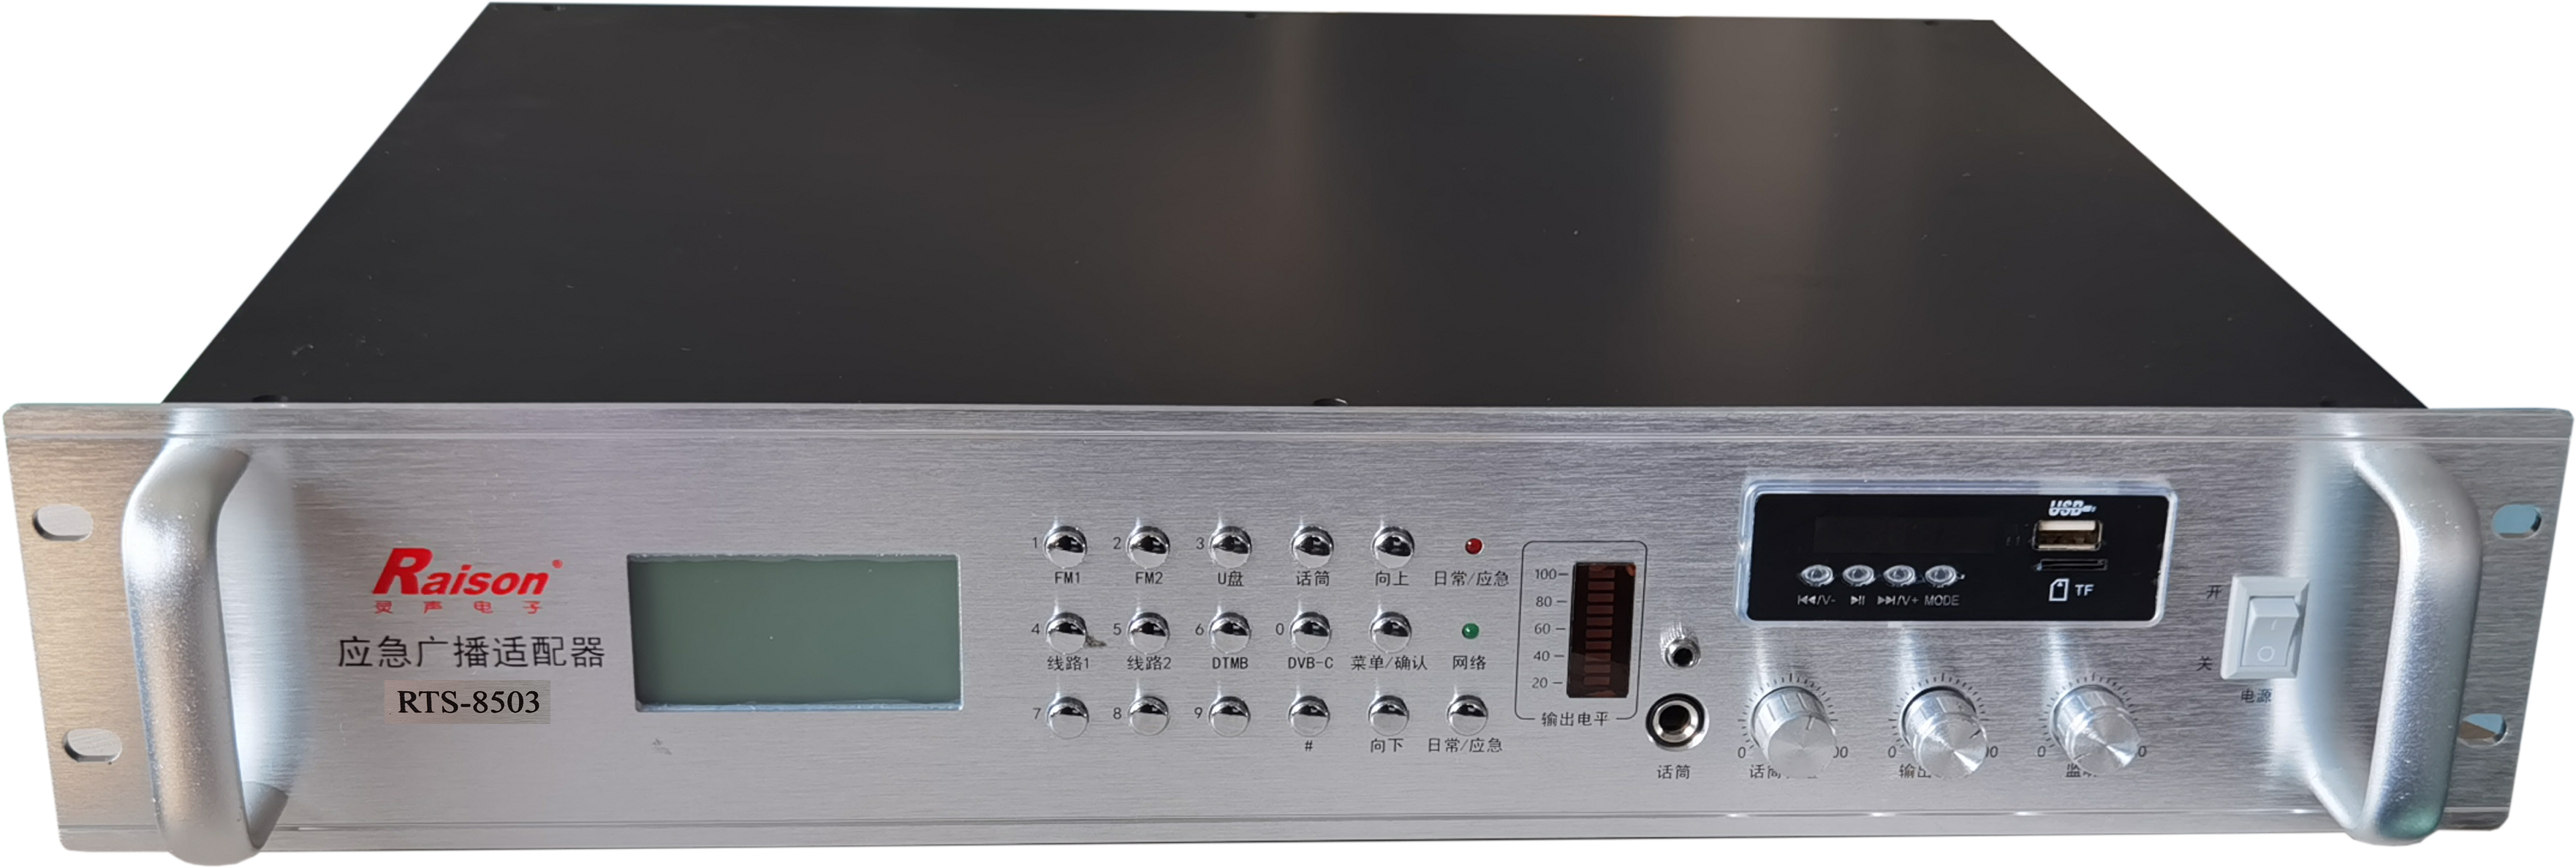 RTS-8503